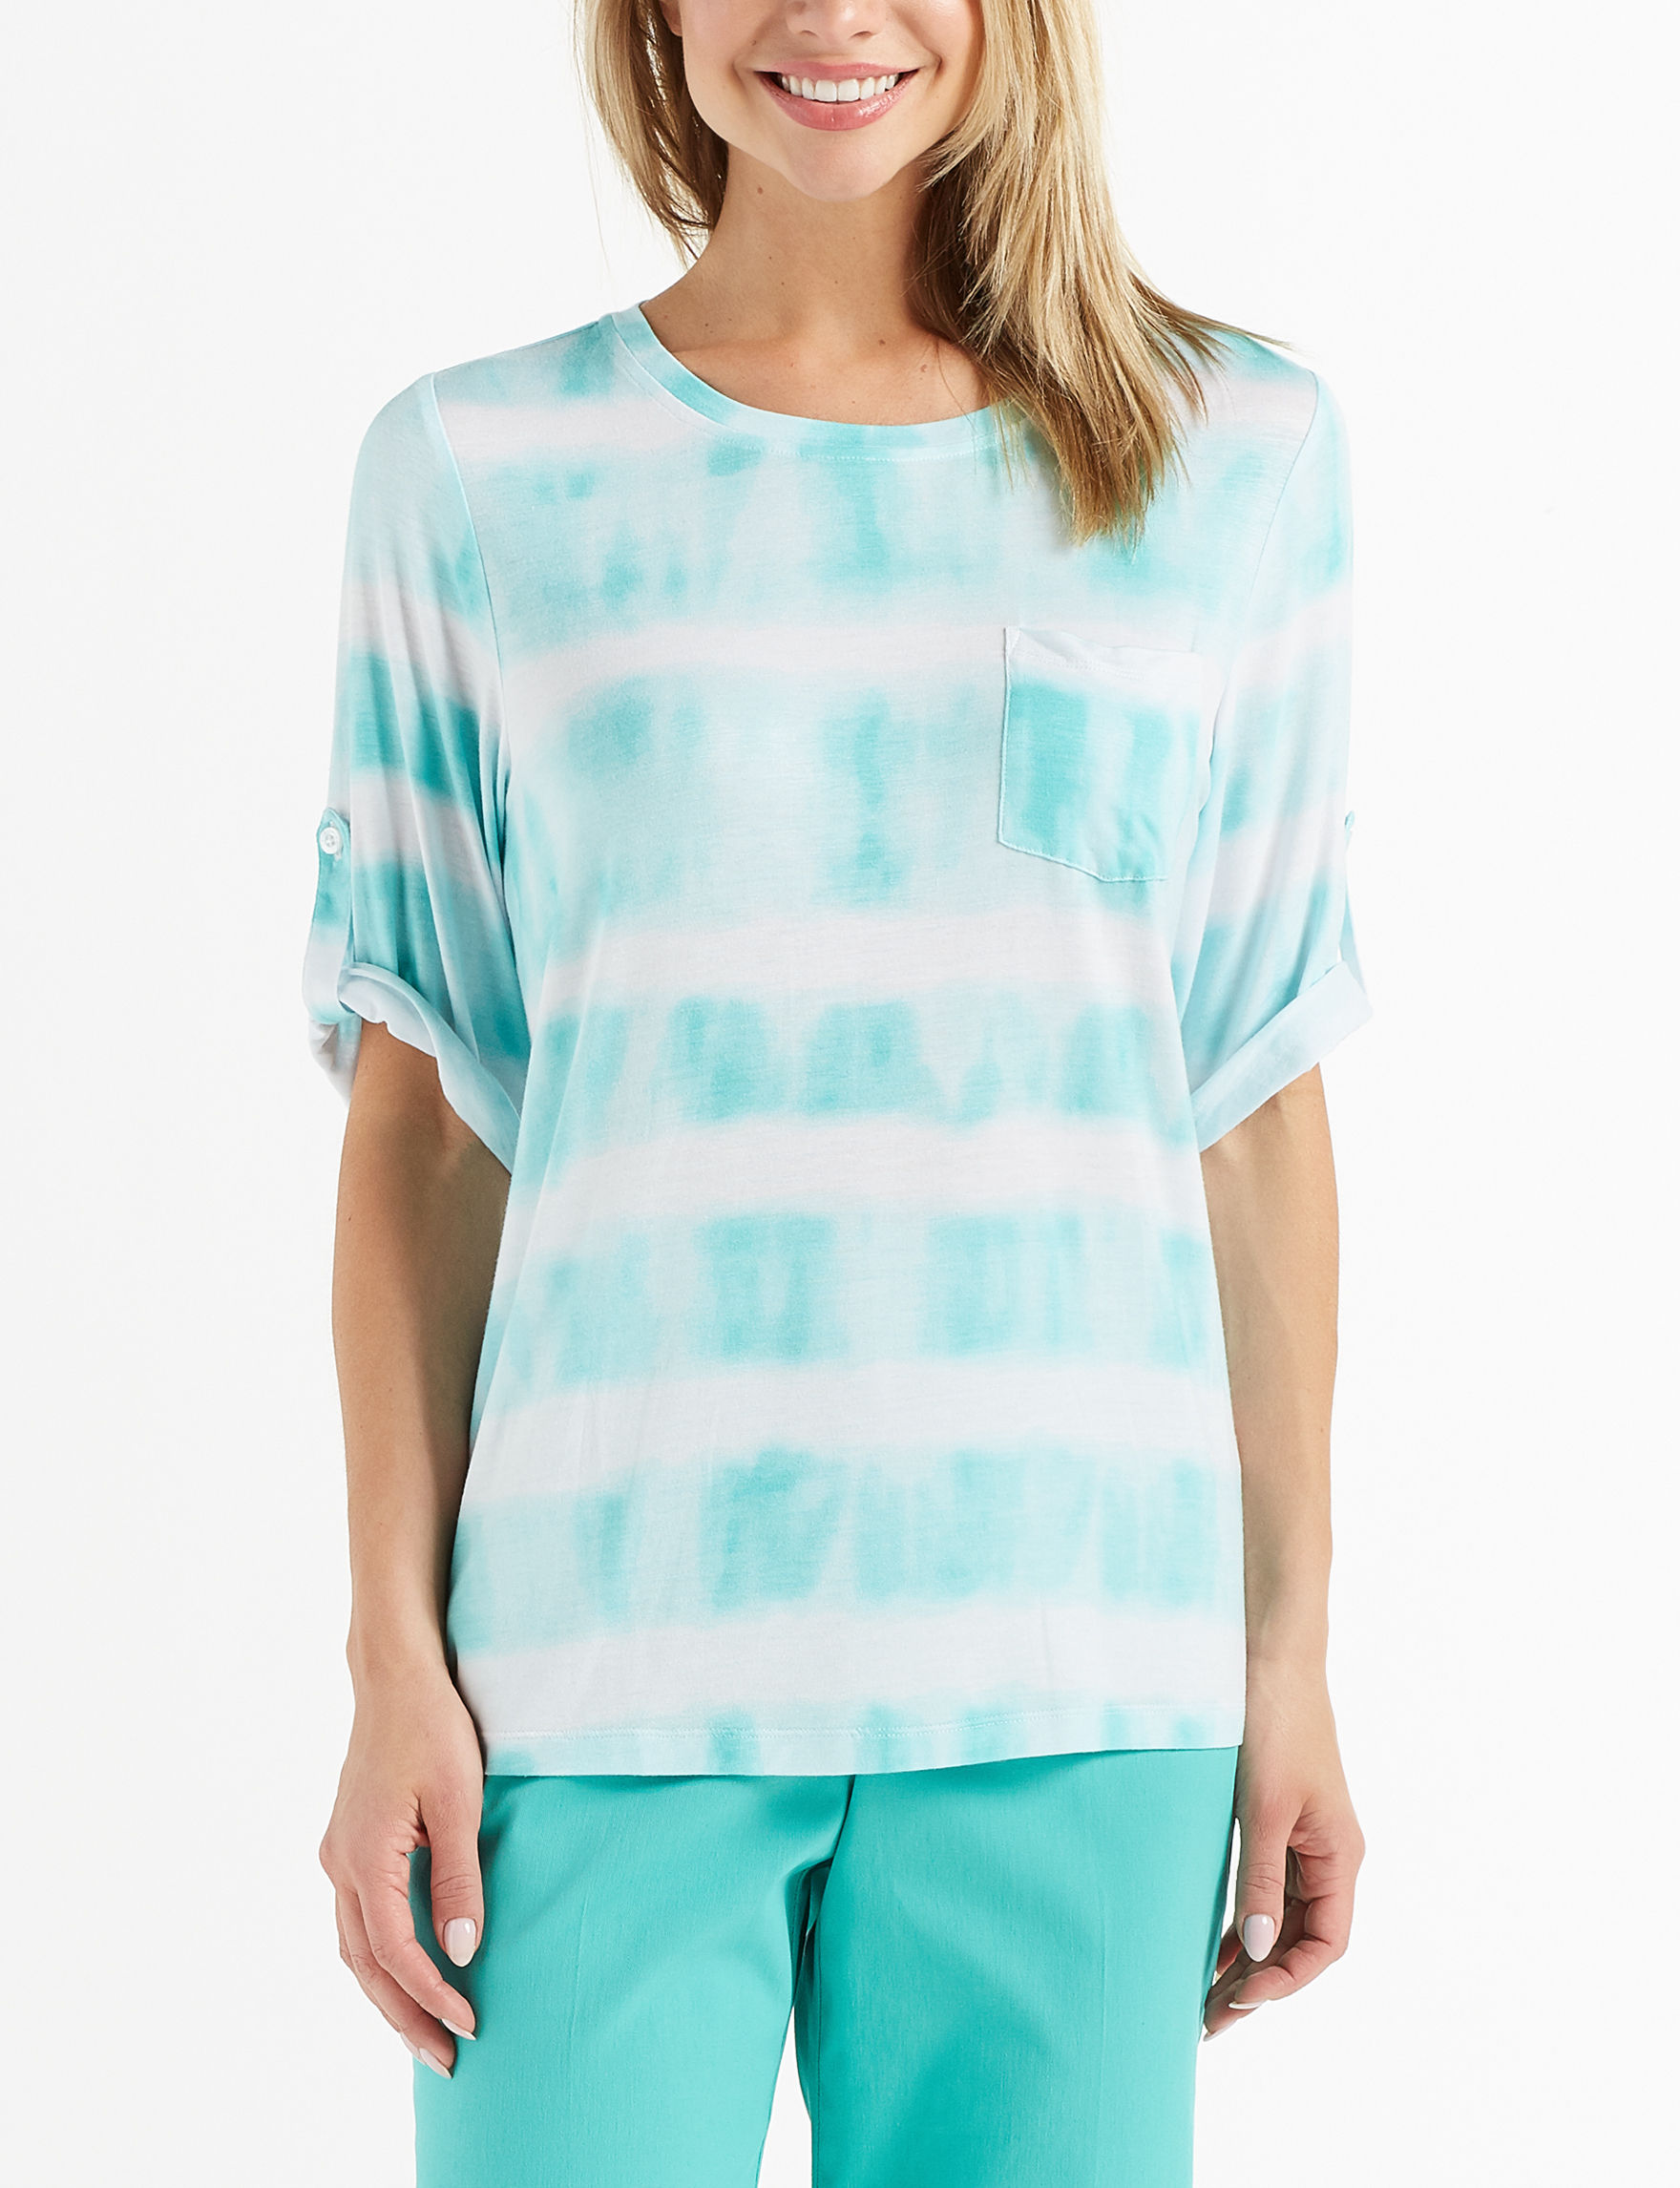 Cathy Daniels Bermuda Shirts & Blouses